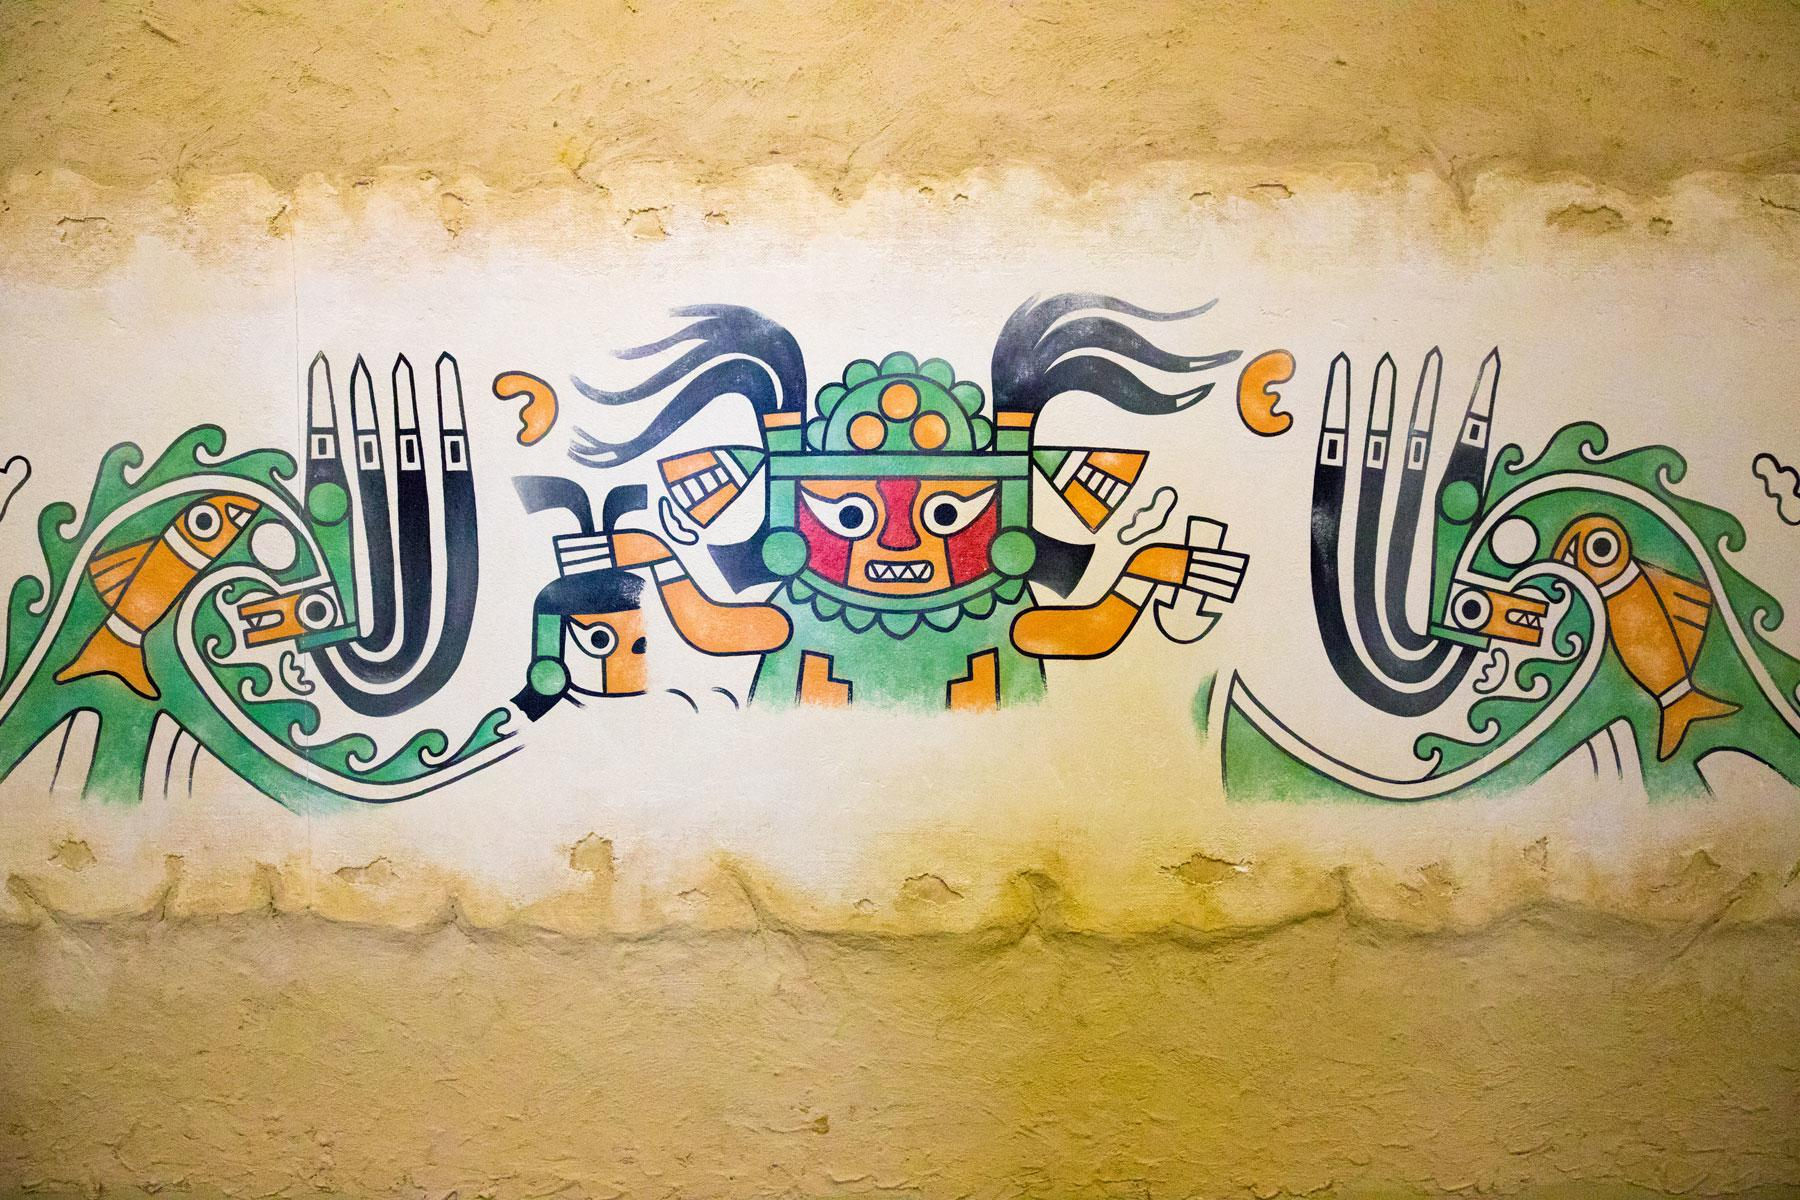 Who Were The Moche People Of Trujillo, Peru?